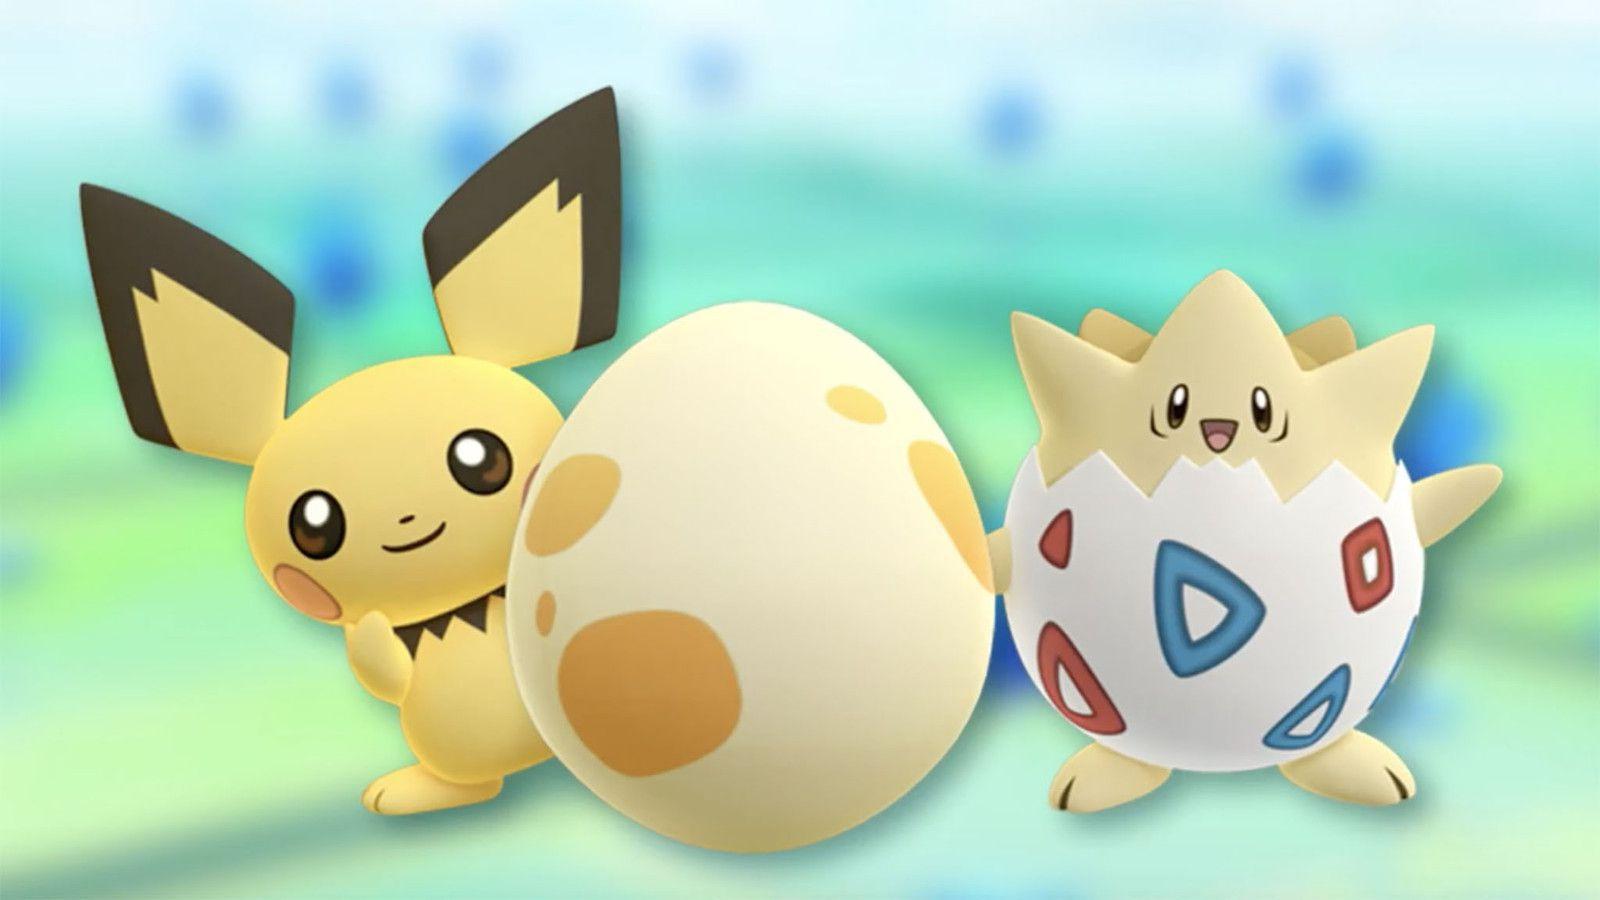 Pokemon Egg Hatching Chart Nintendo Switch Black Friday Deals